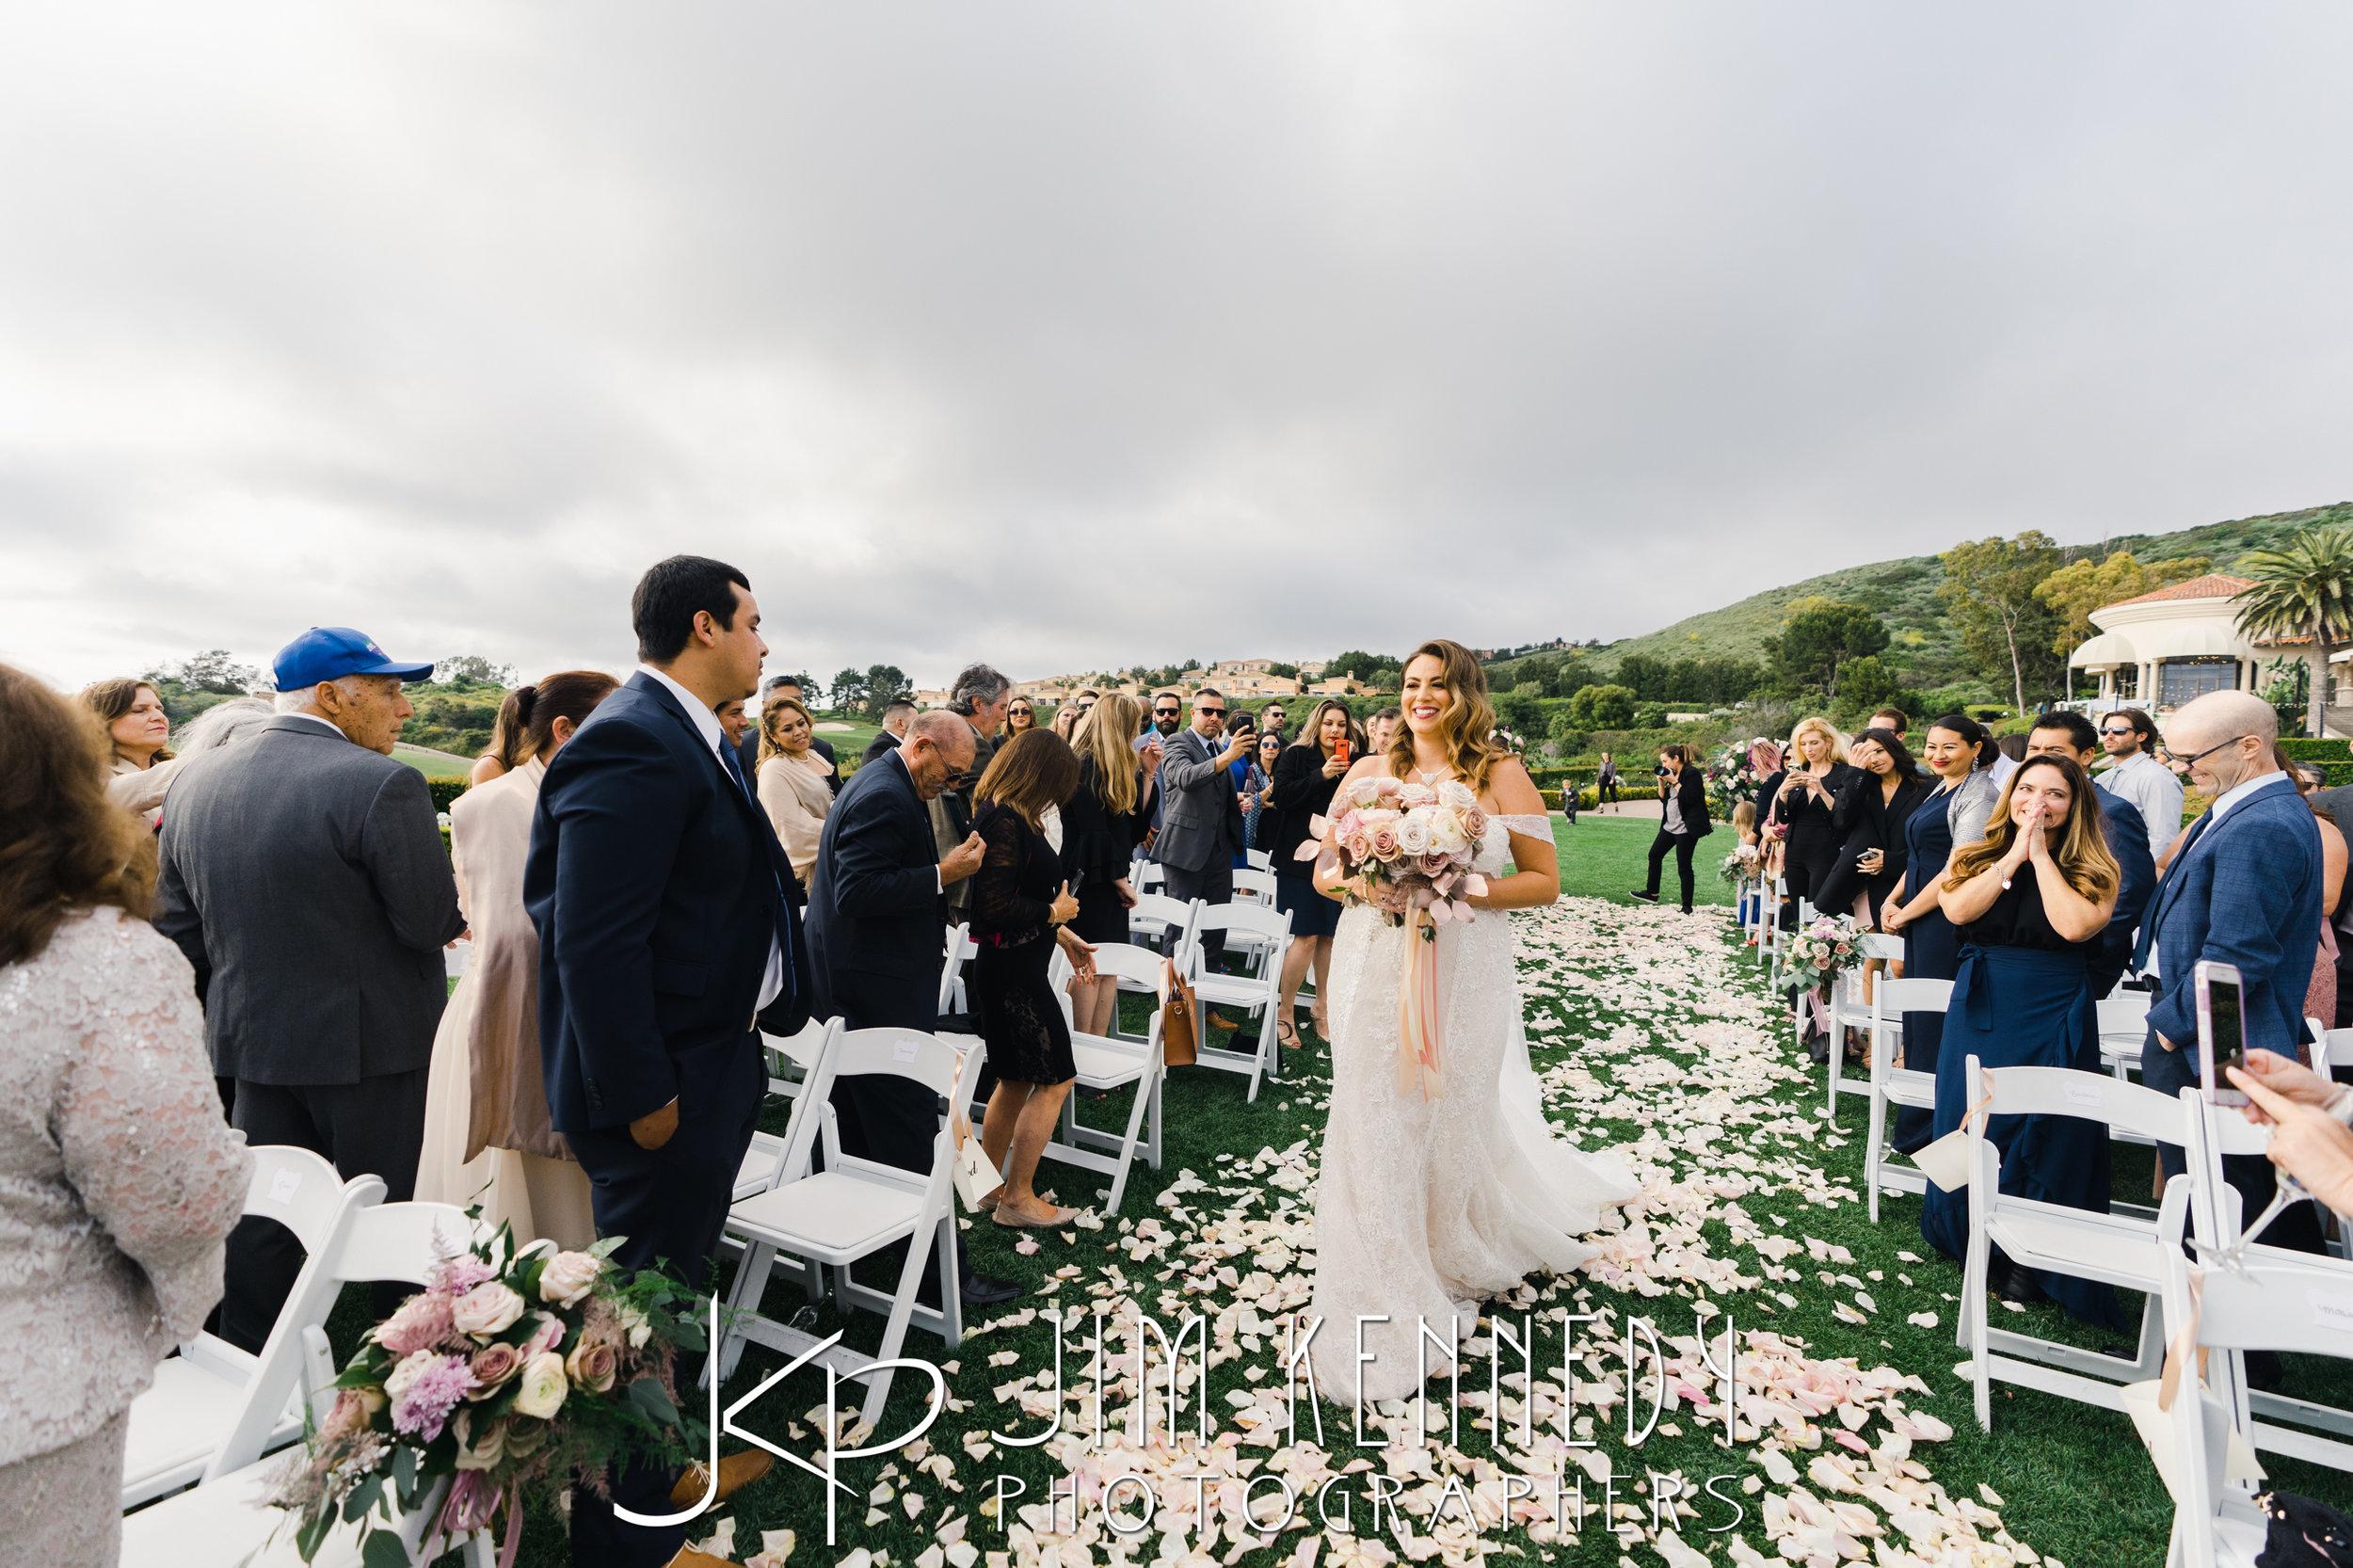 pelican-hill-wedding-jim-kenedy-photographers_0111.JPG